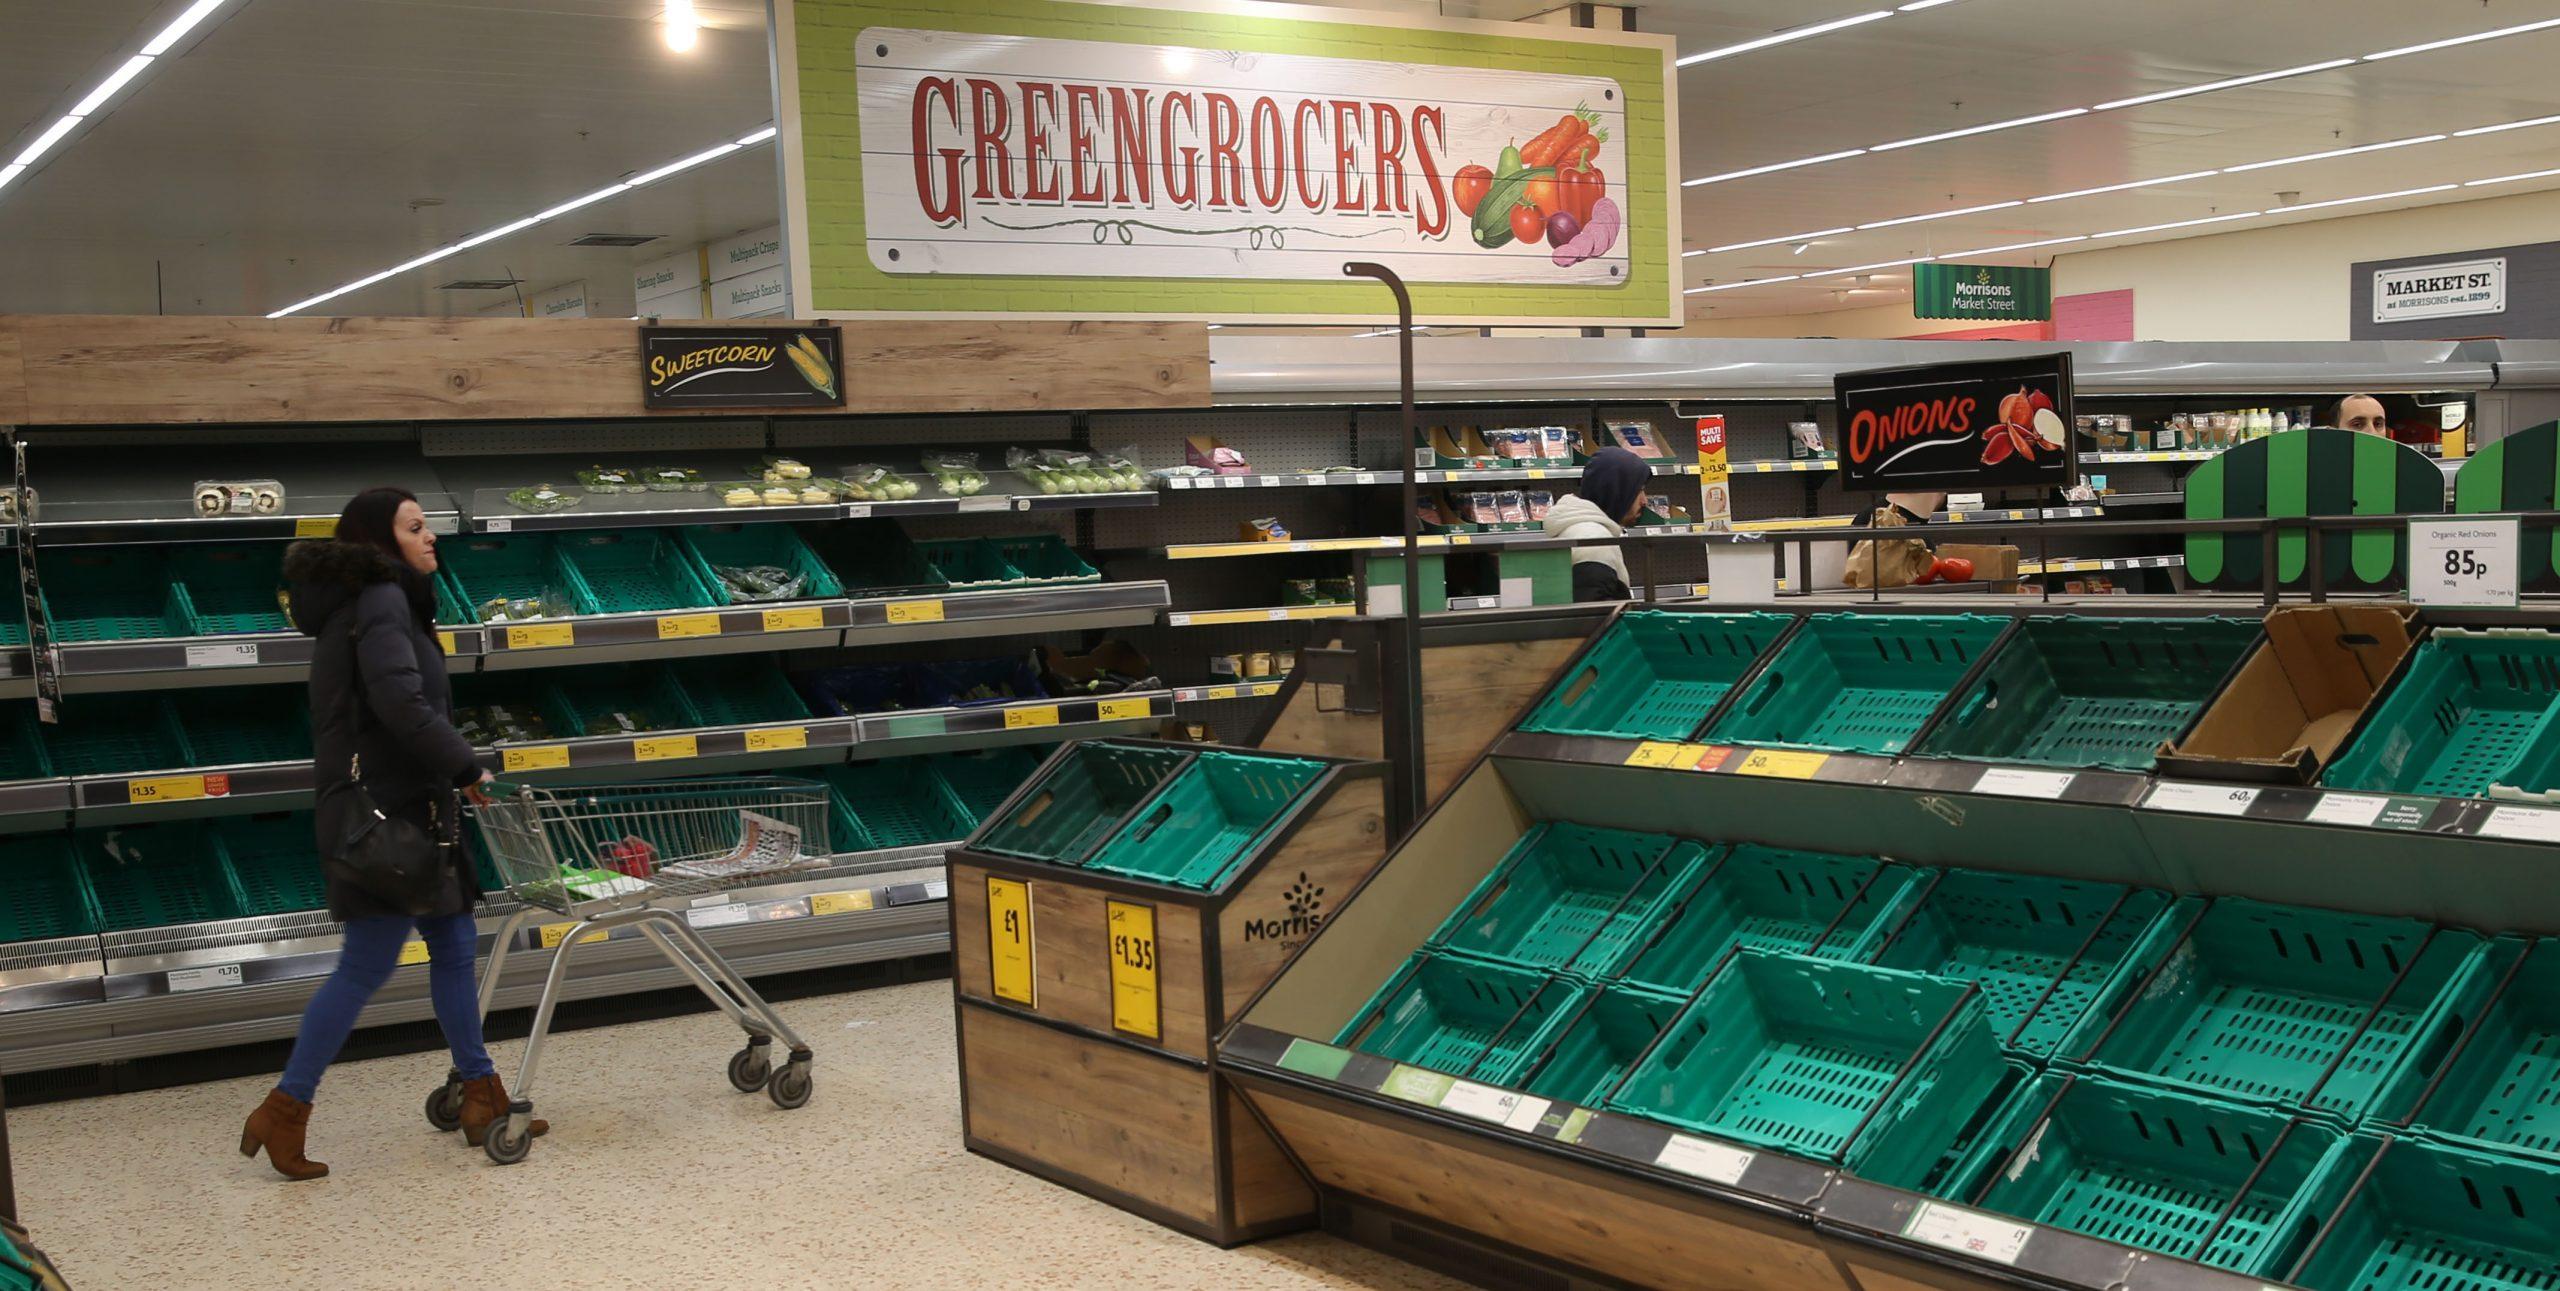 Coronavirus: Morrisons donates groceries worth £10 million to help restock Britain's food banks